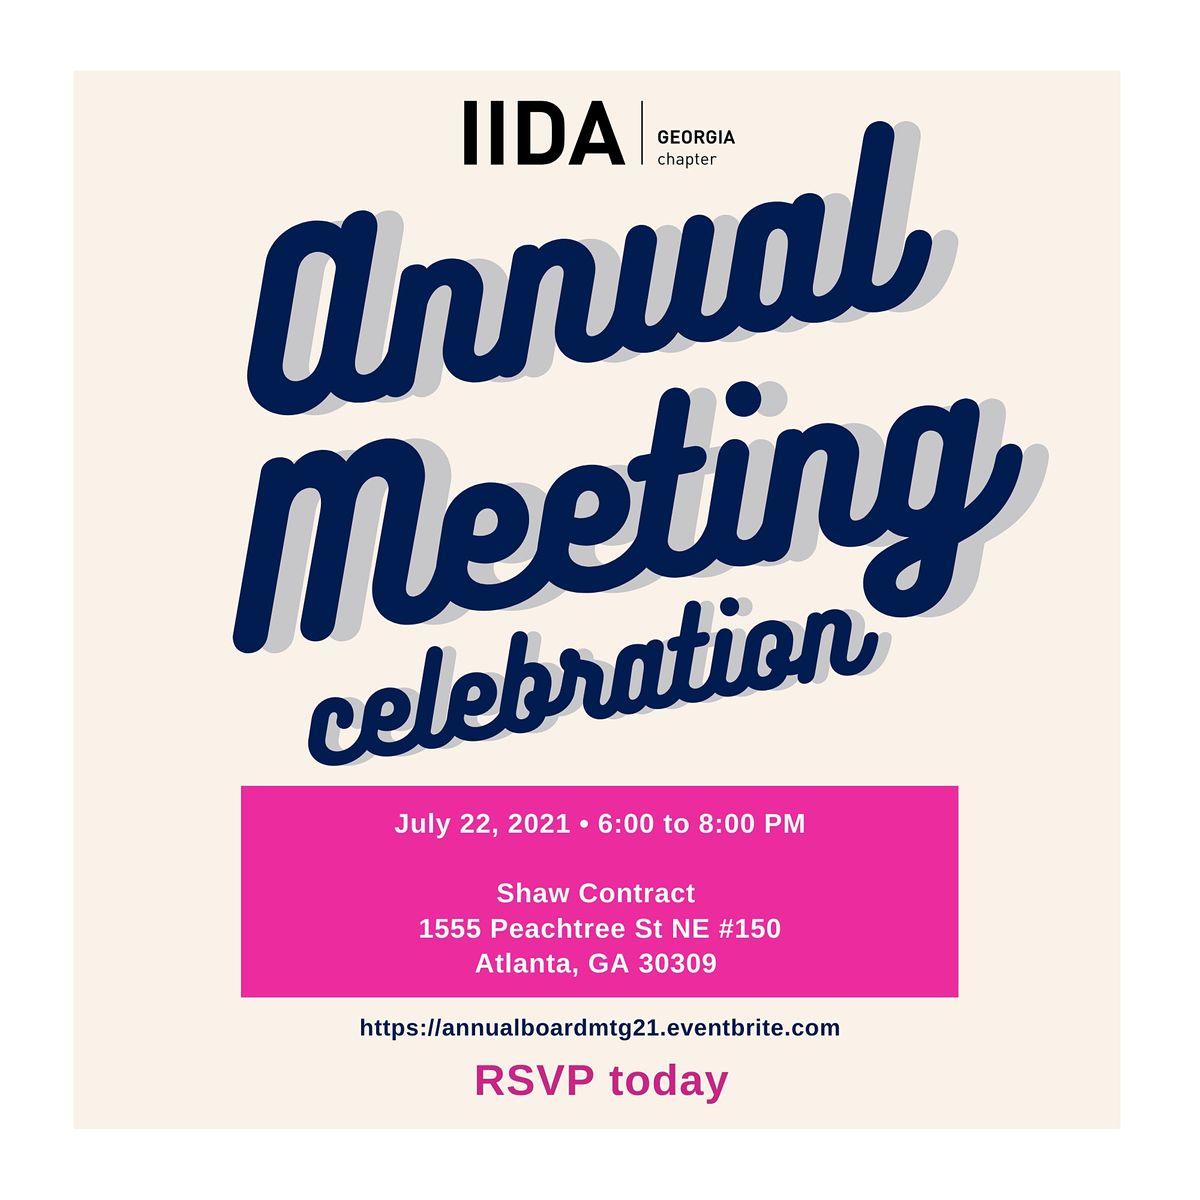 IIDA Georgia 2021 Annual Meeting